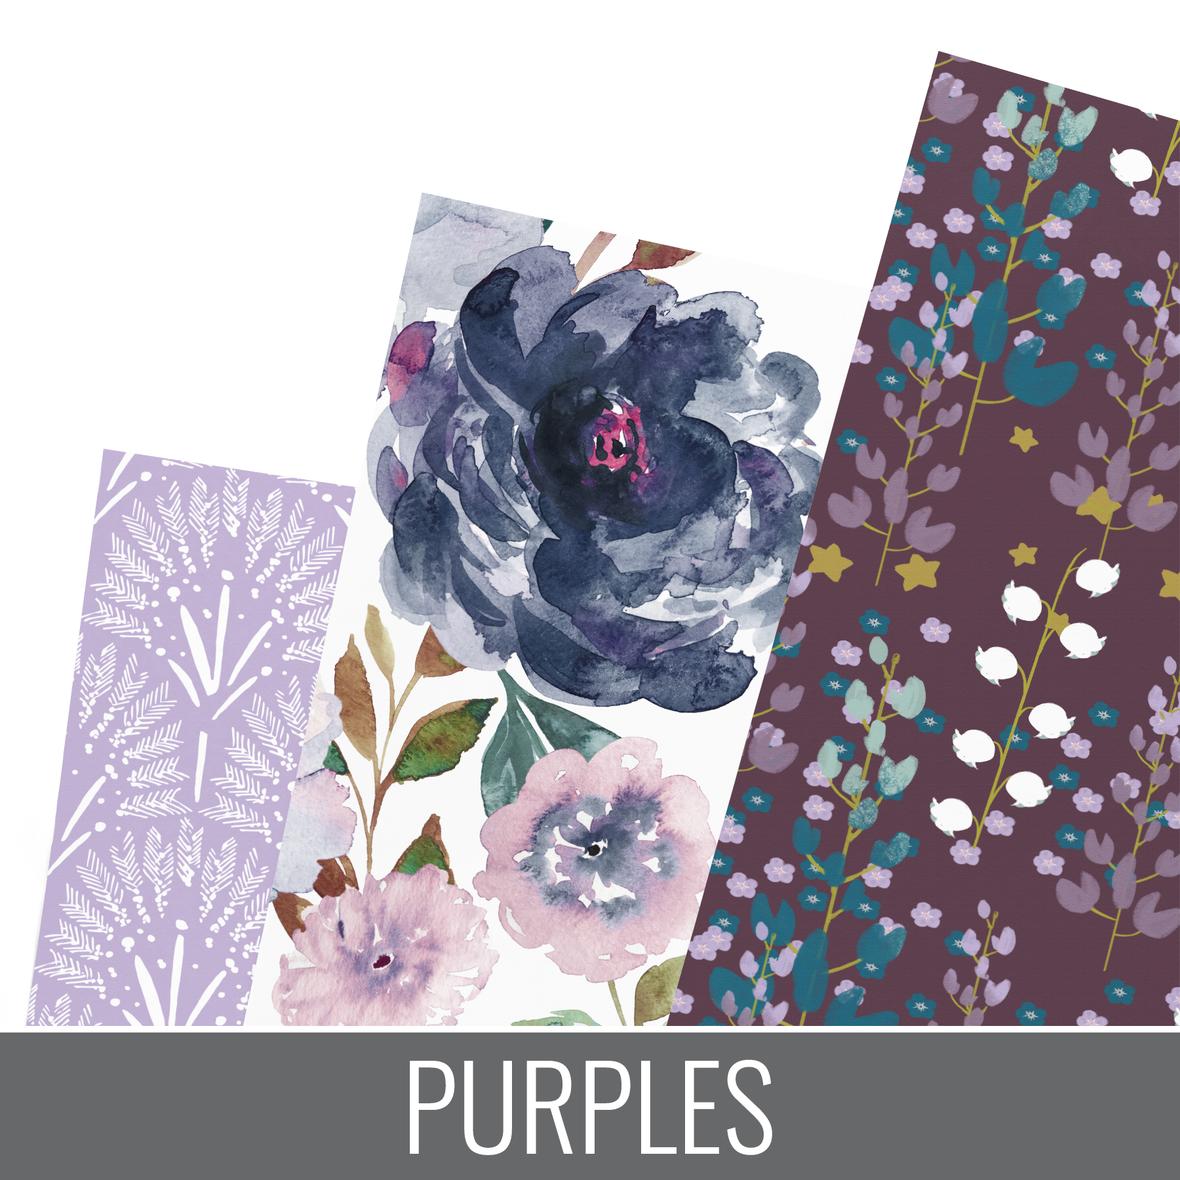 Purples final